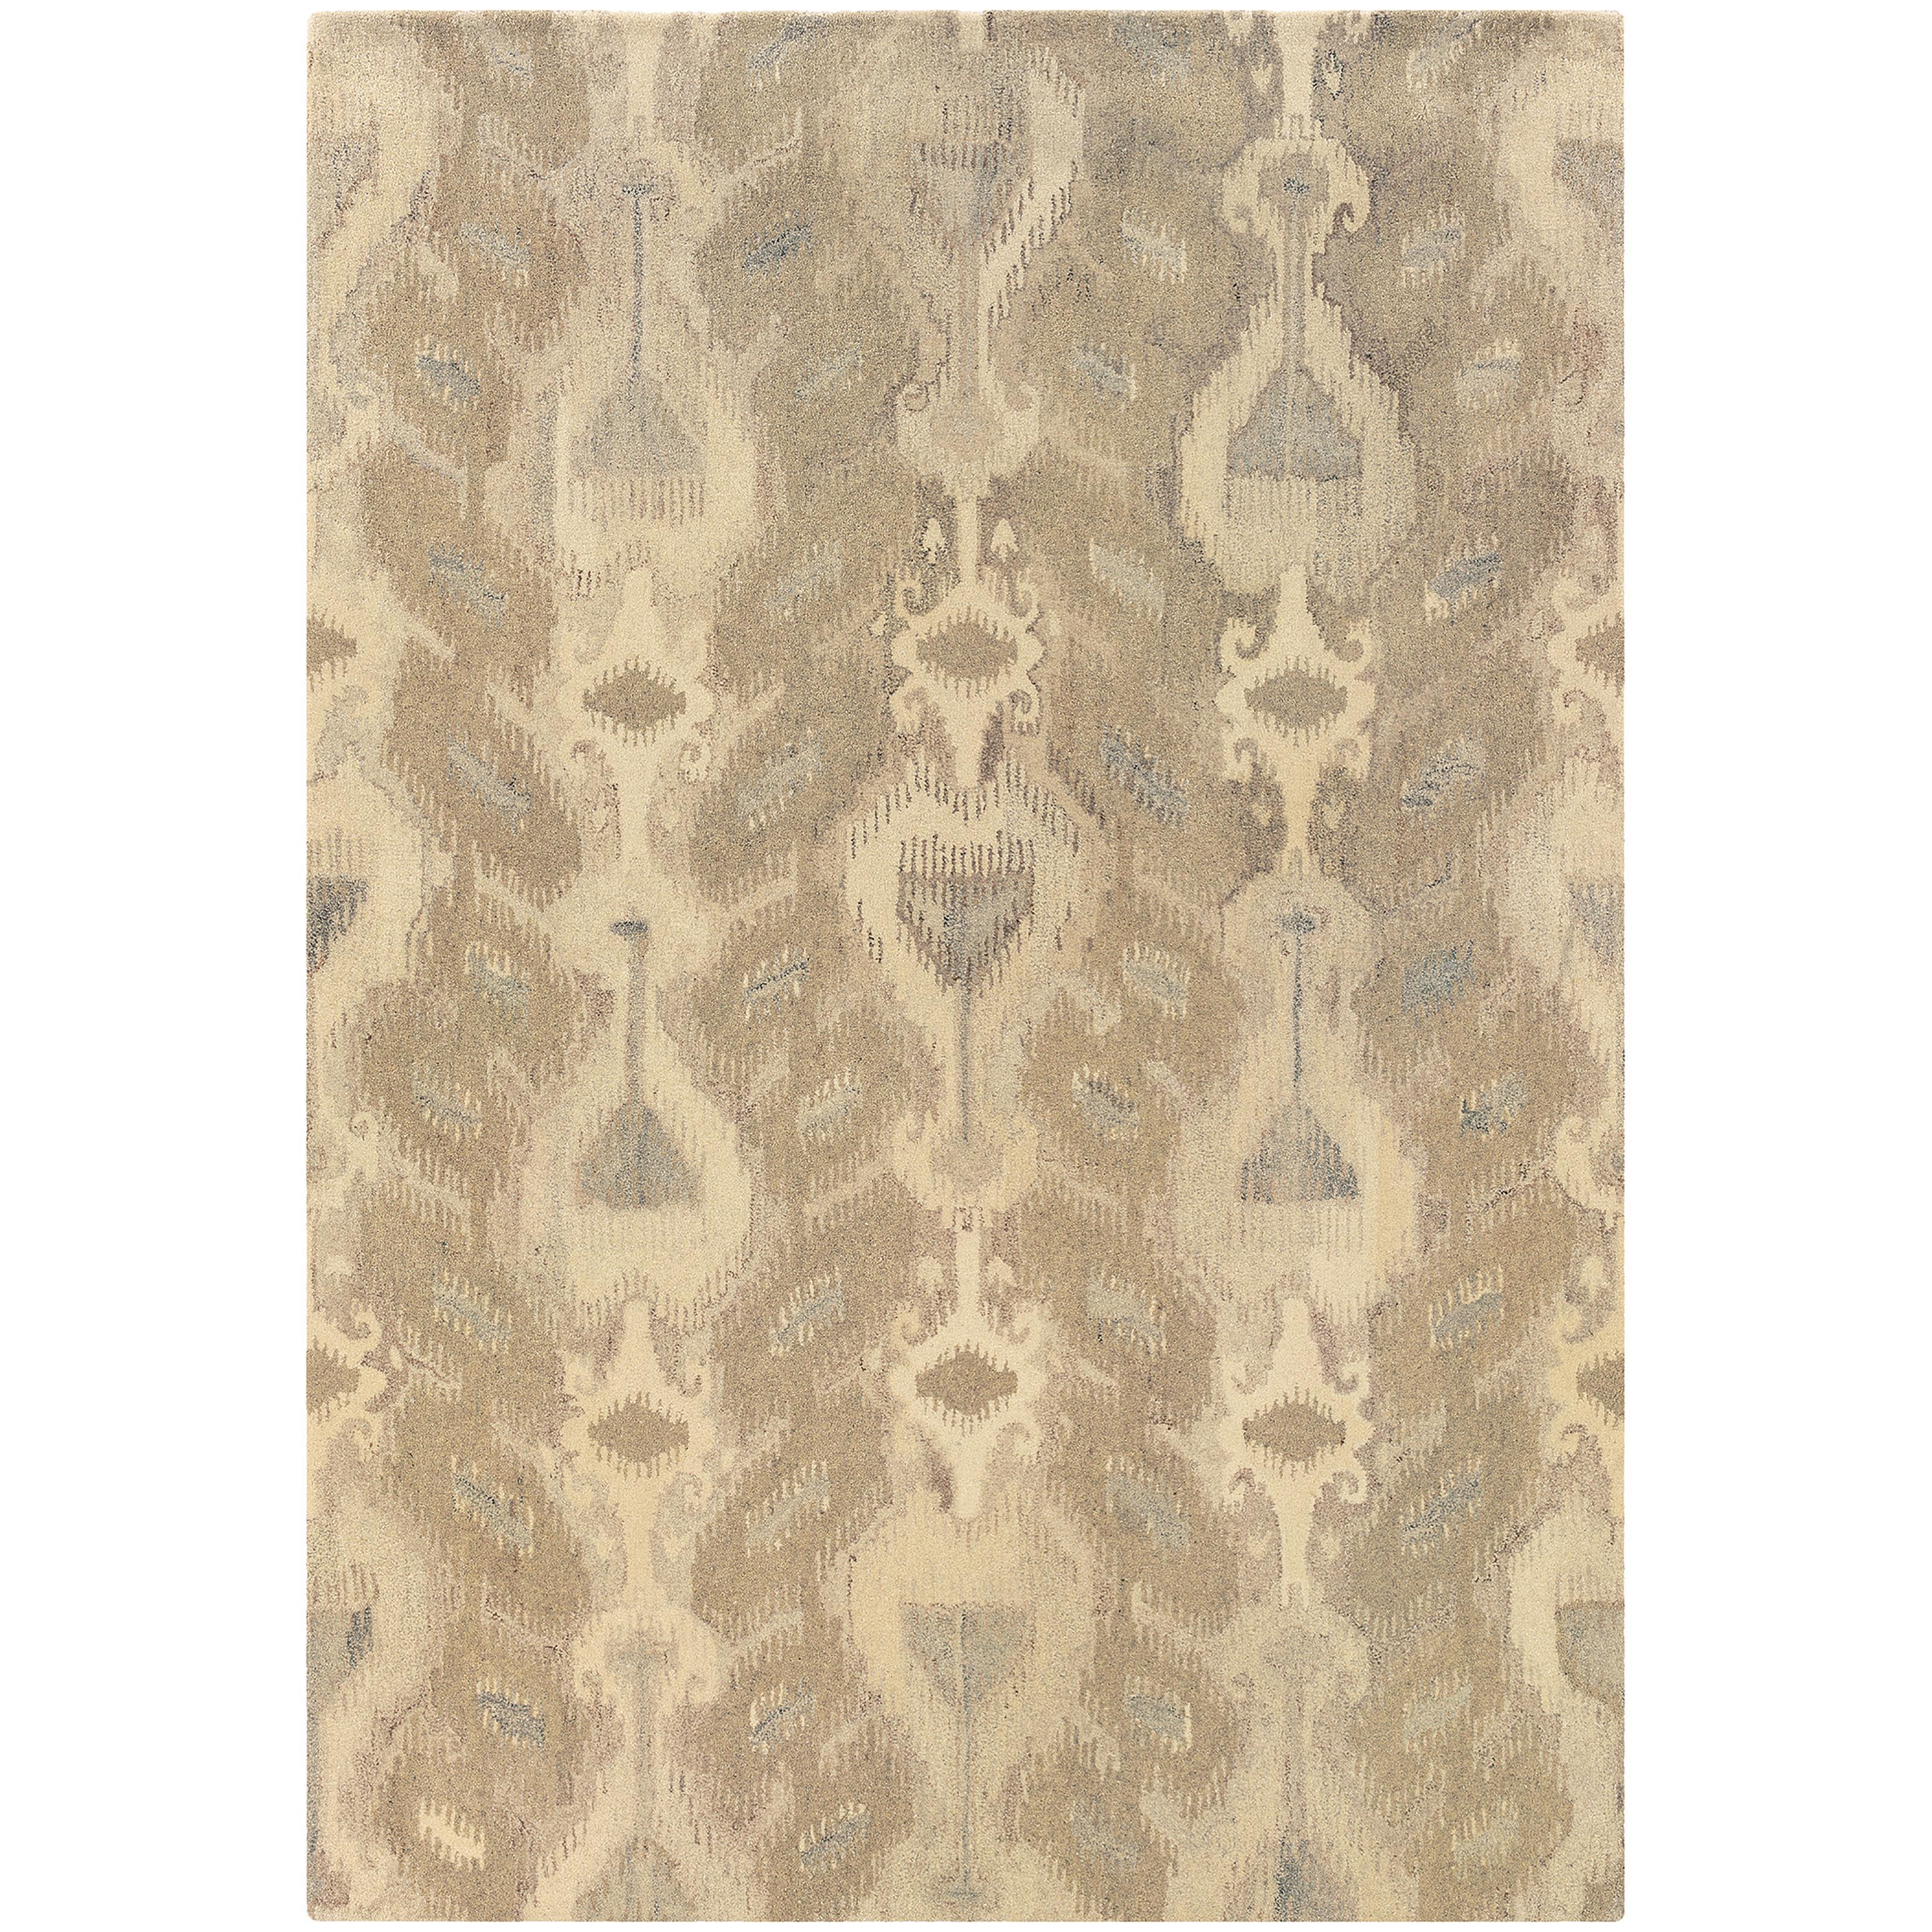 "Anastasia 5' 0"" X  8' 0"" Rug by Oriental Weavers at Novello Home Furnishings"